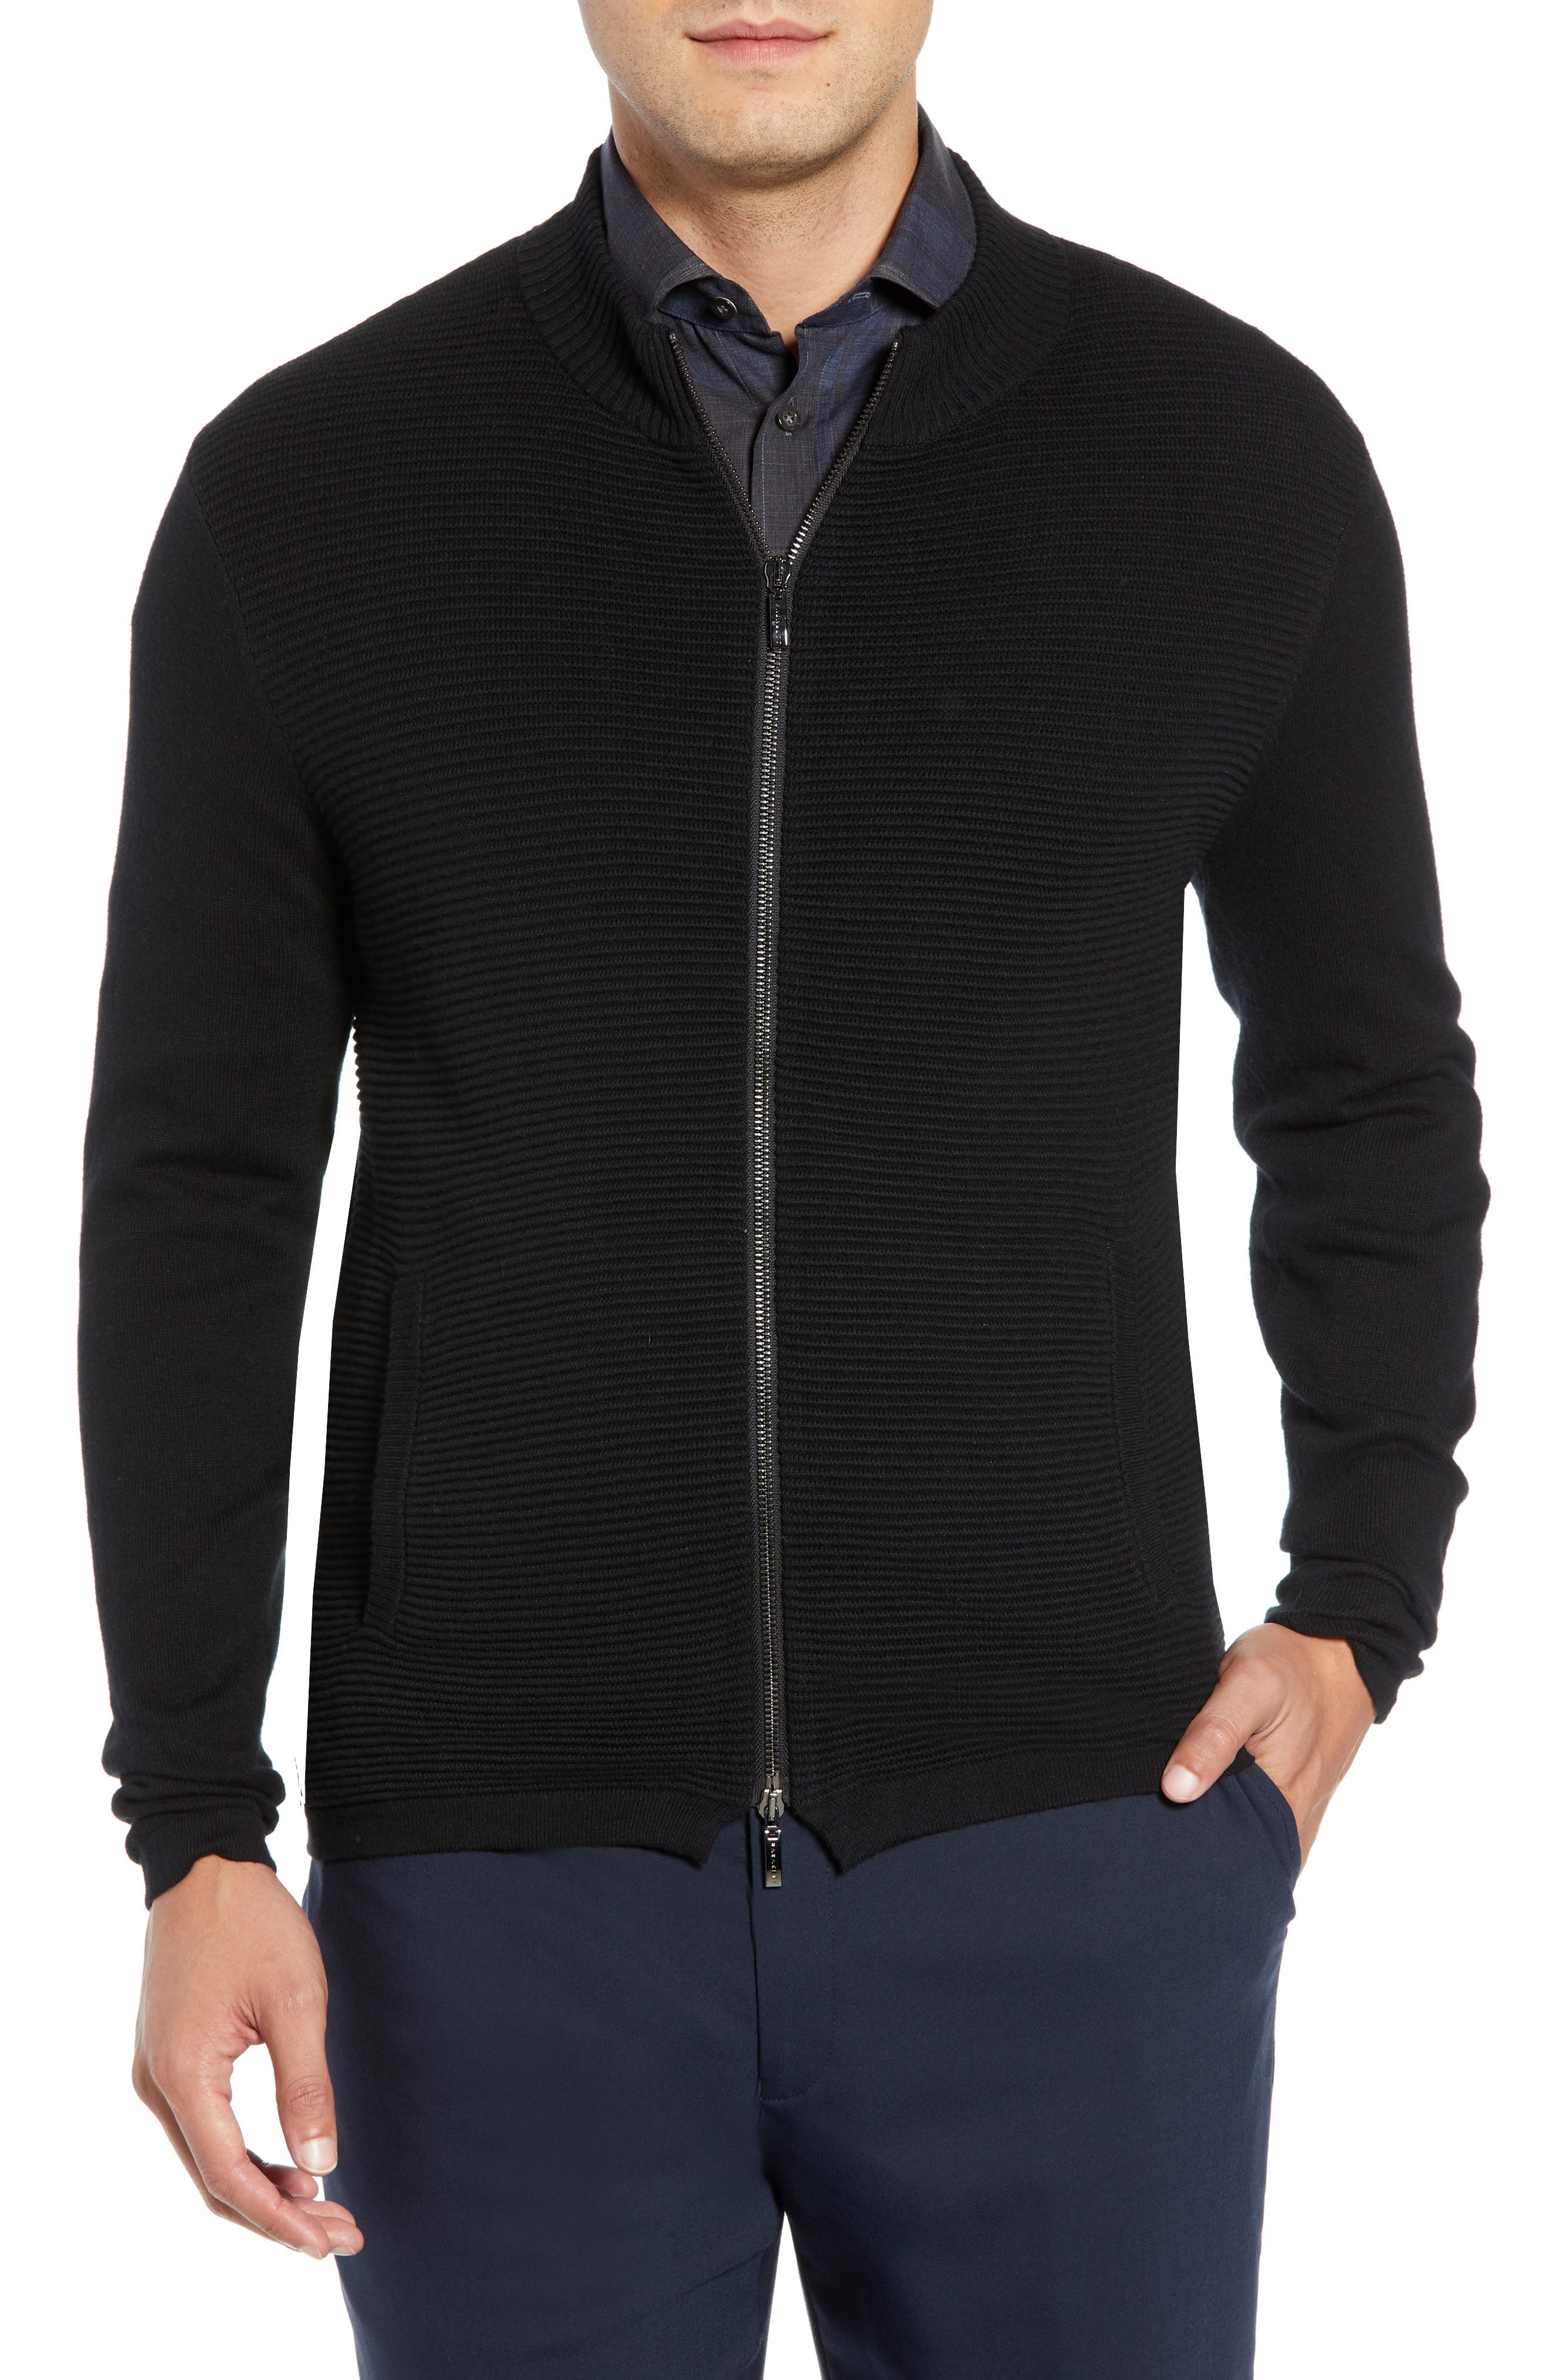 Yorkville Zip Sweater,                         Main,                         color, BLACK